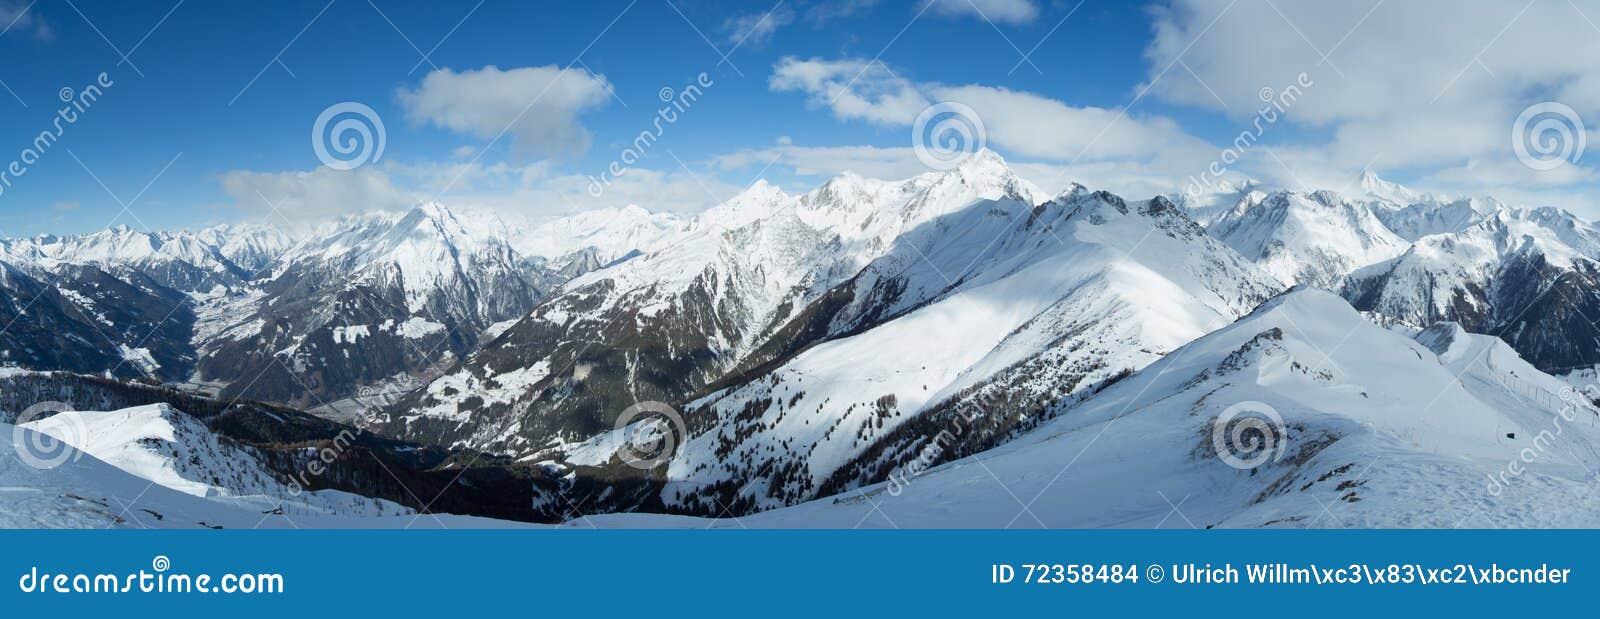 Hohe Tauern高山全景